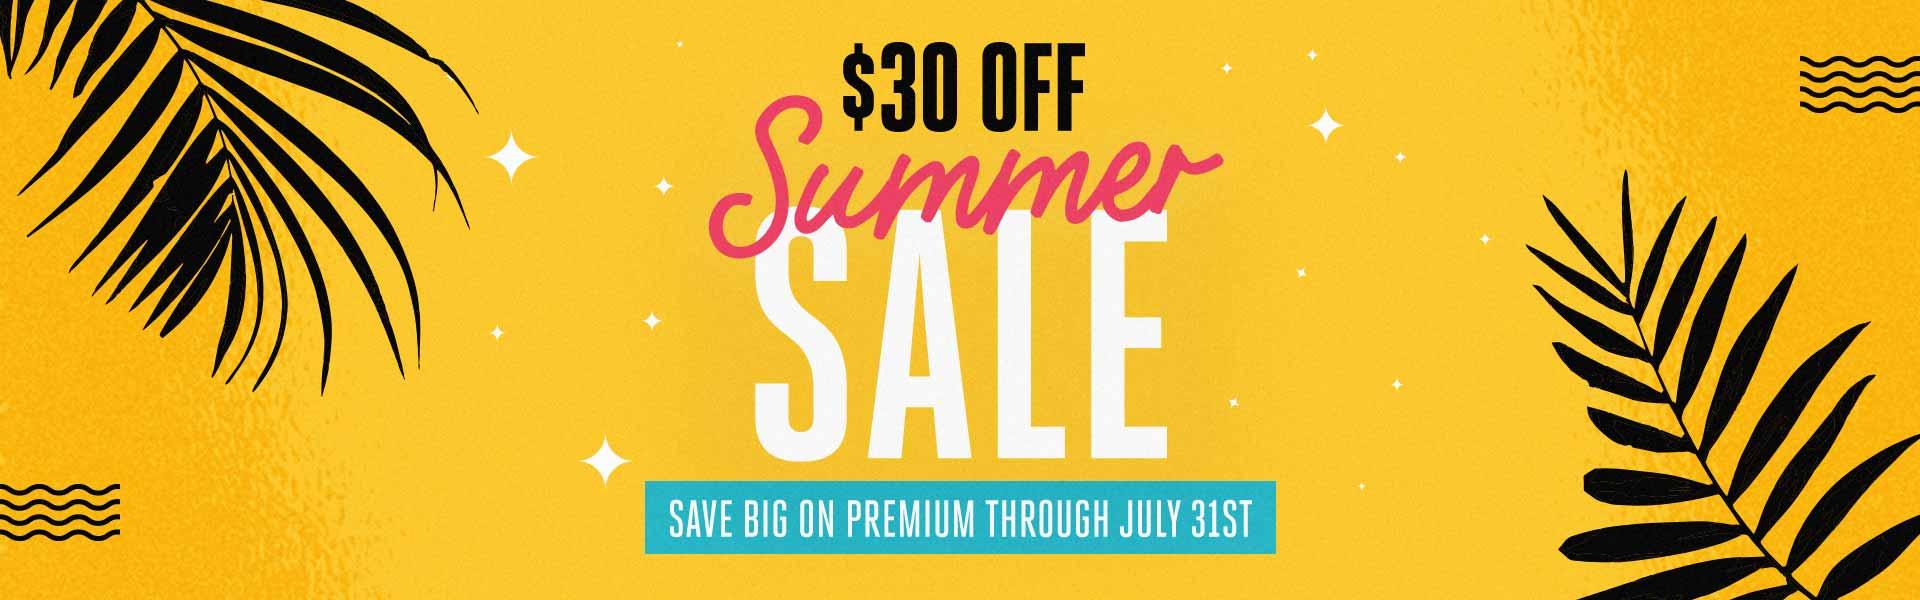 CMG Summer Sale - Save Big On Premium